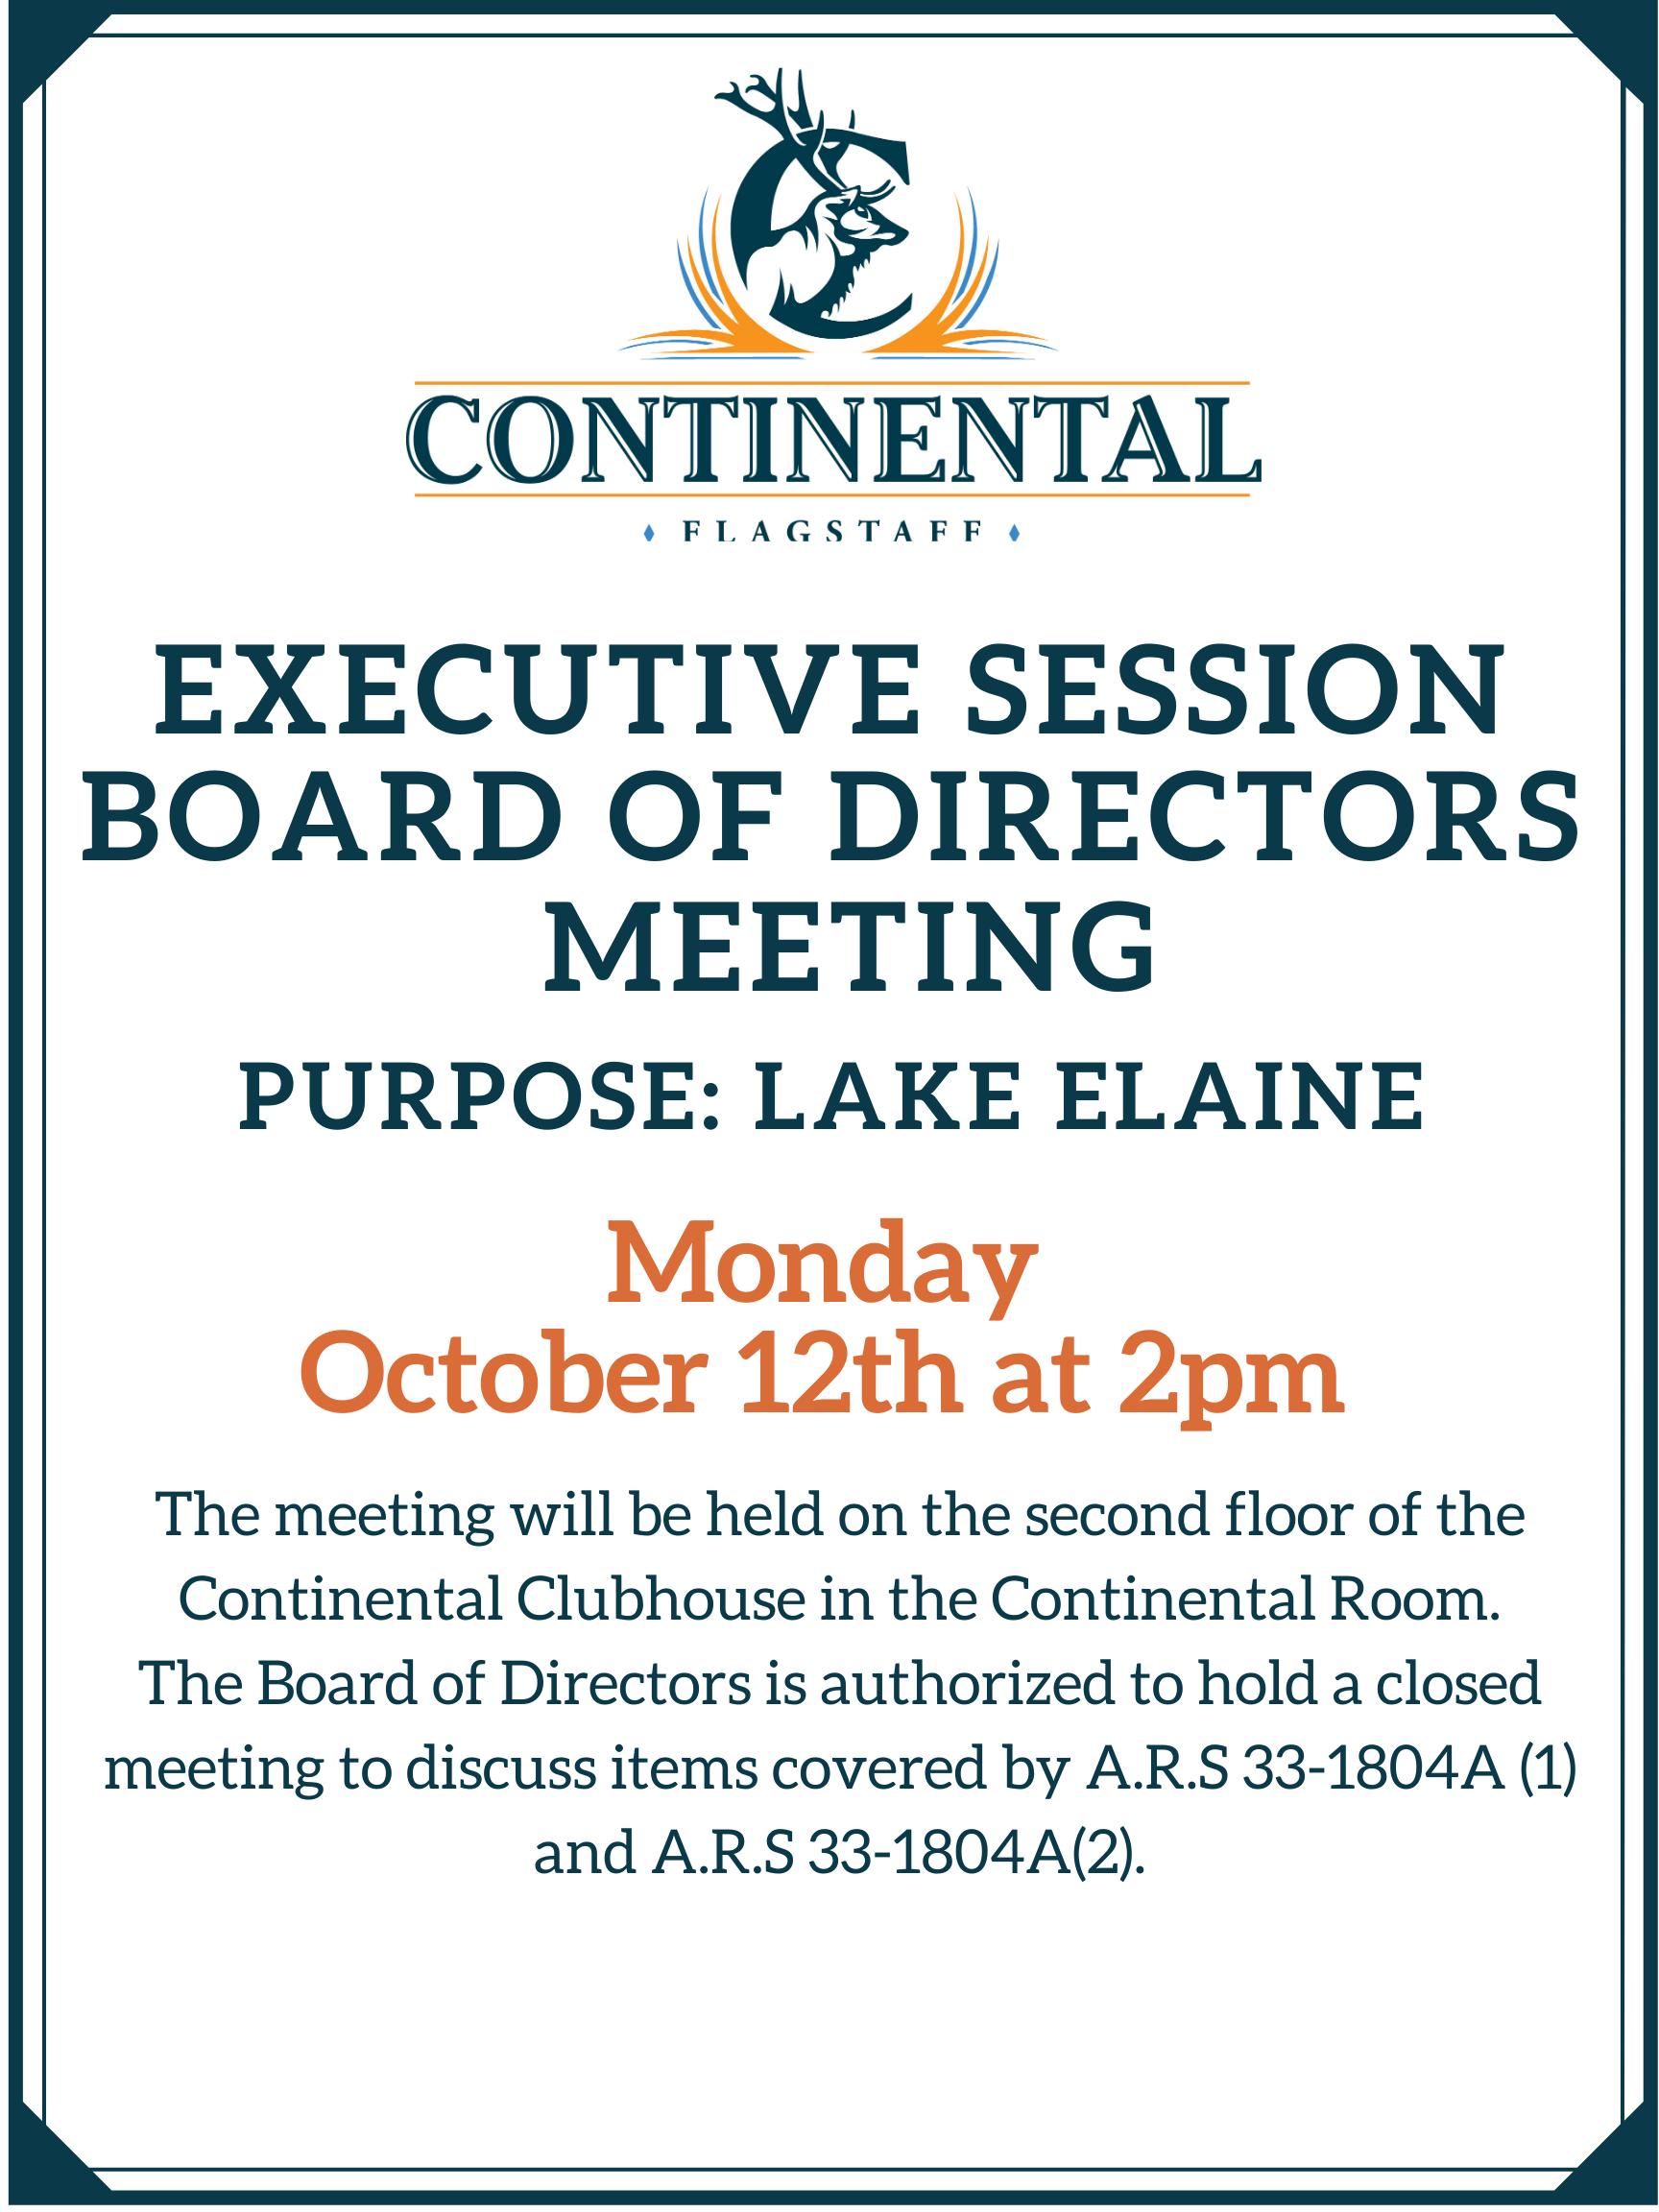 Board of Directors Meeting